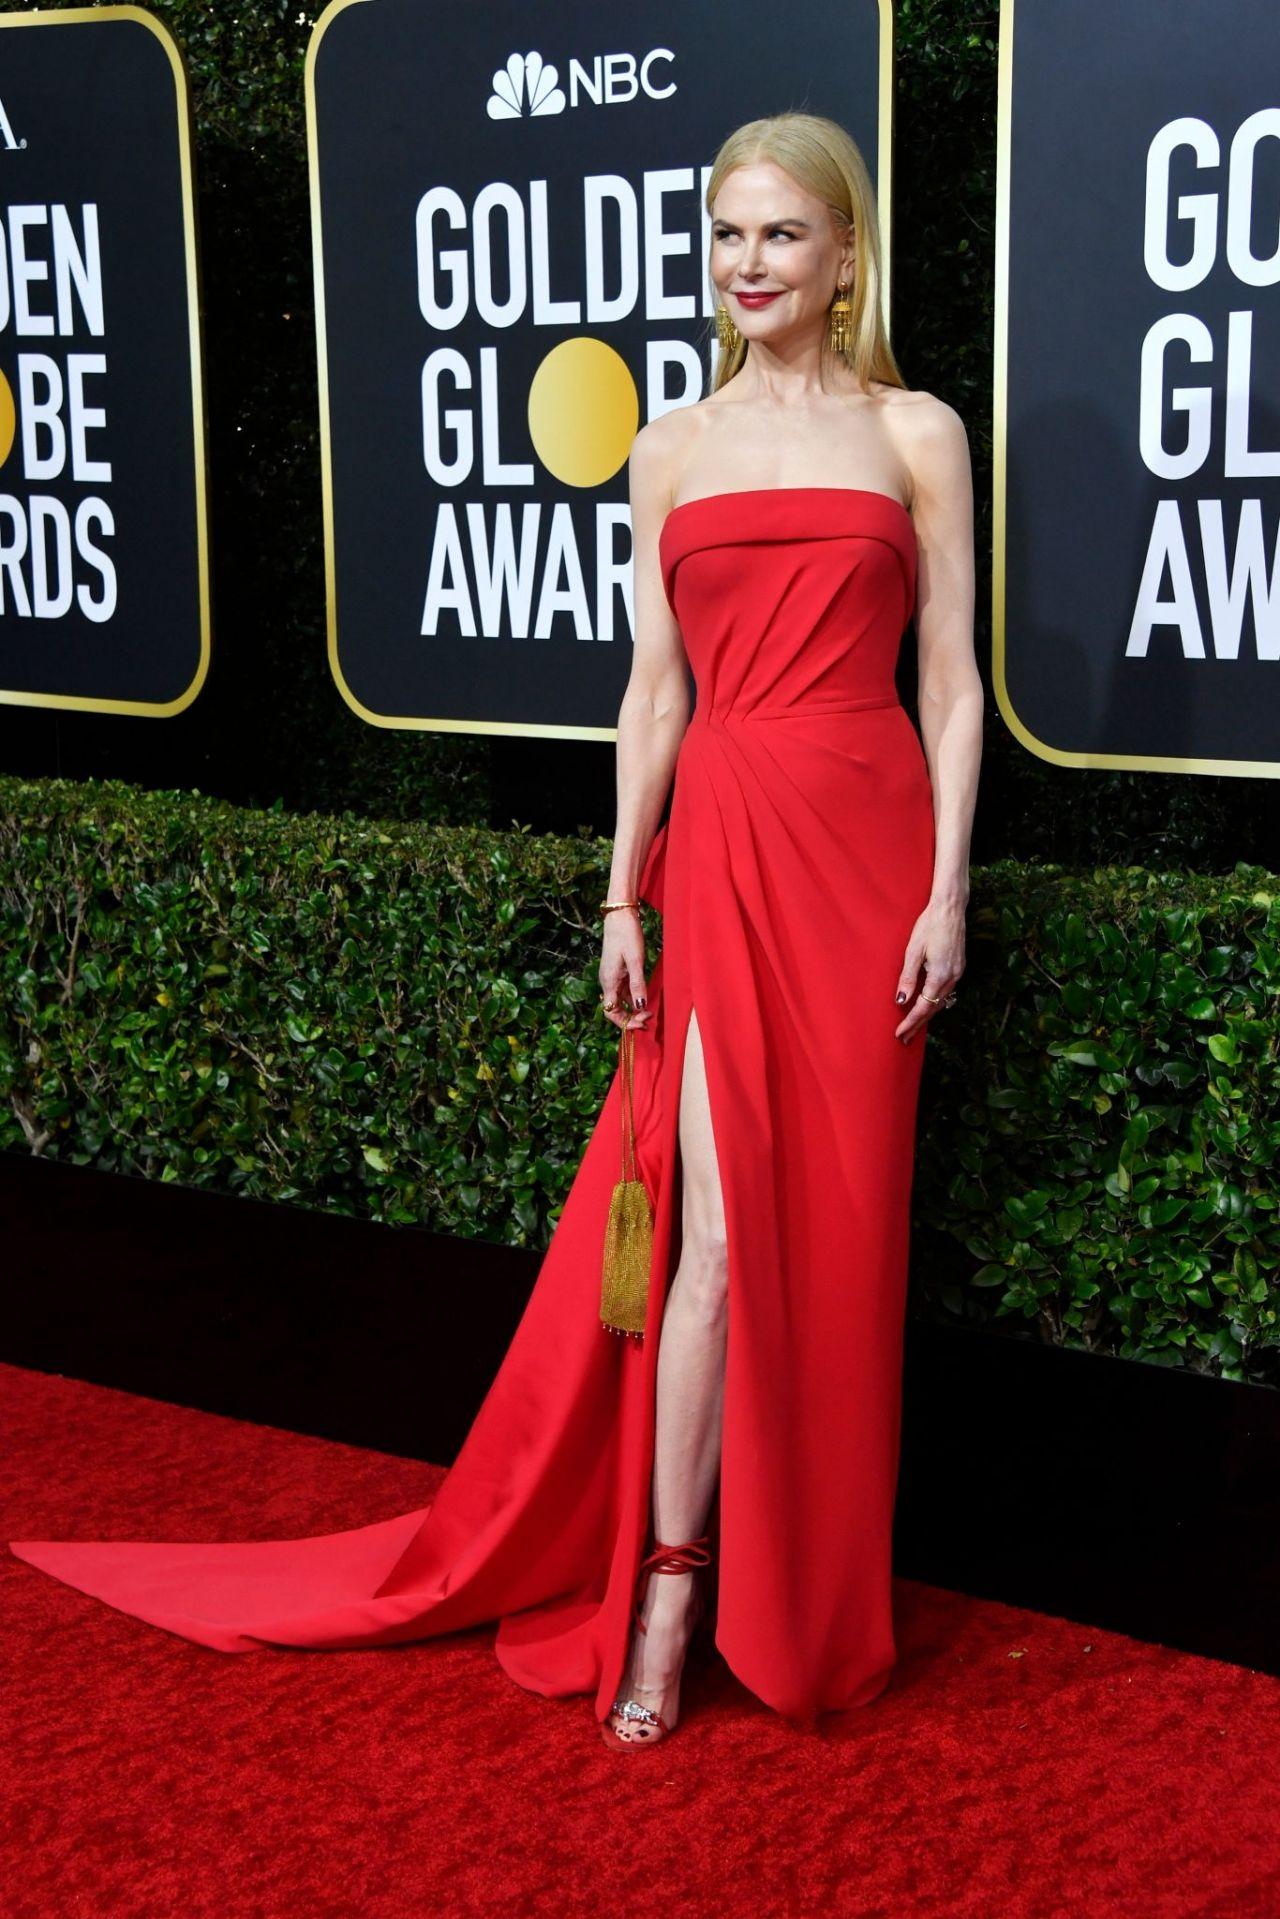 Golden Globe Awards 2021 Gewinner